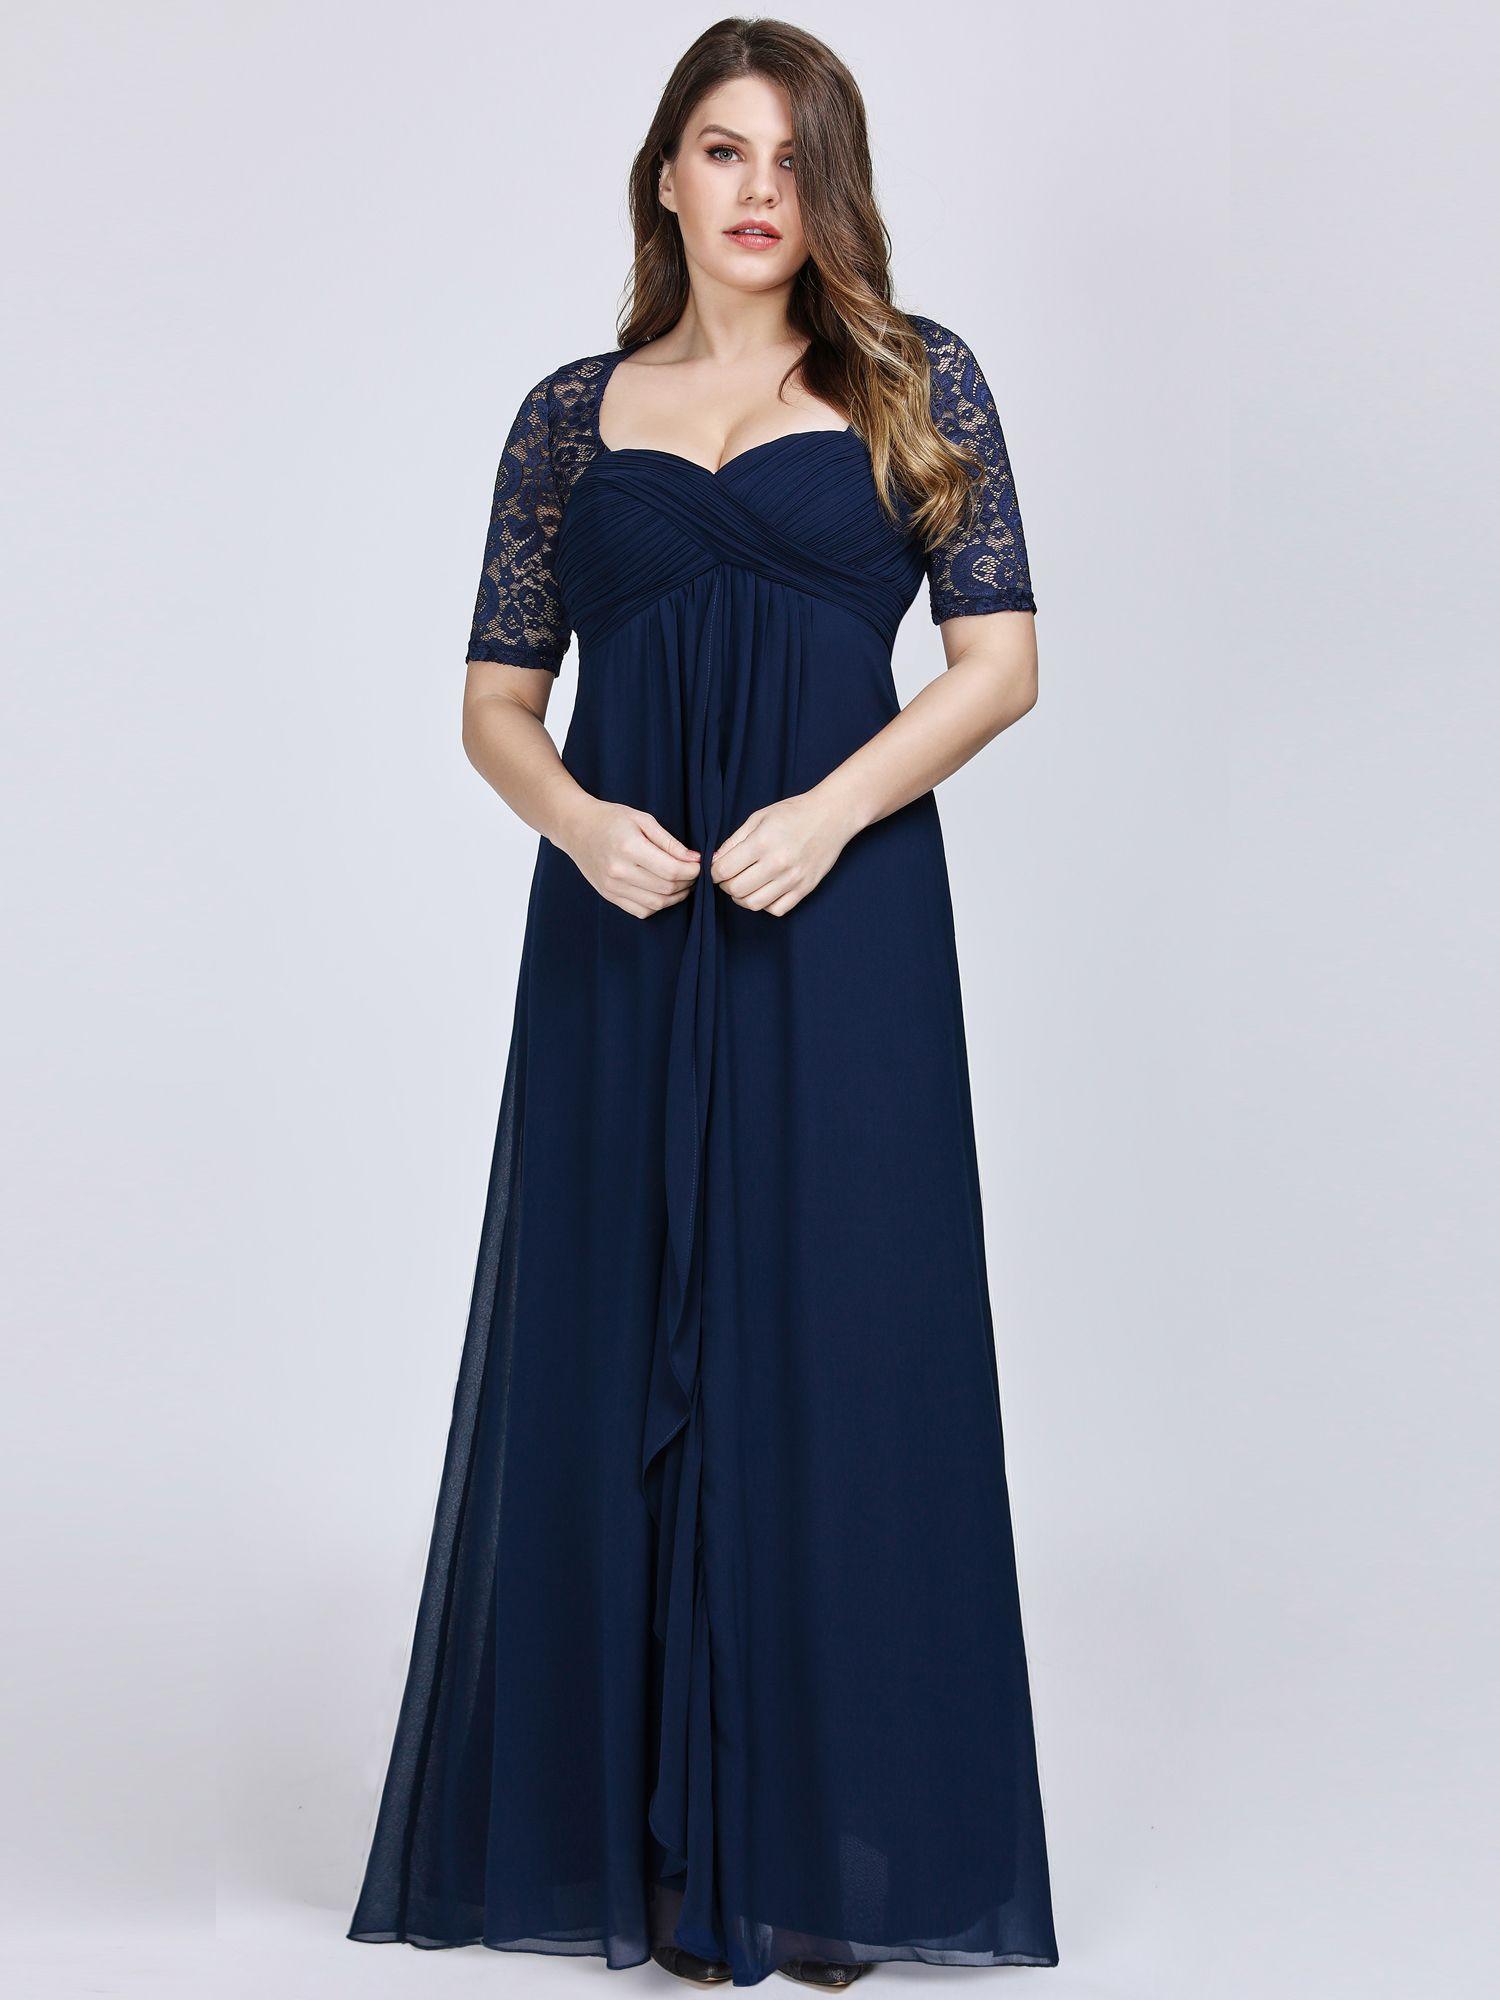 Ever Pretty Ever Pretty Womens Elegant Short Sleeve Evening Dresses For Women 07625 Navy Blue Us22 Walmart Com In 2021 Evening Dresses Plus Size Evening Dresses Empire Waist Evening Dress [ 2000 x 1500 Pixel ]